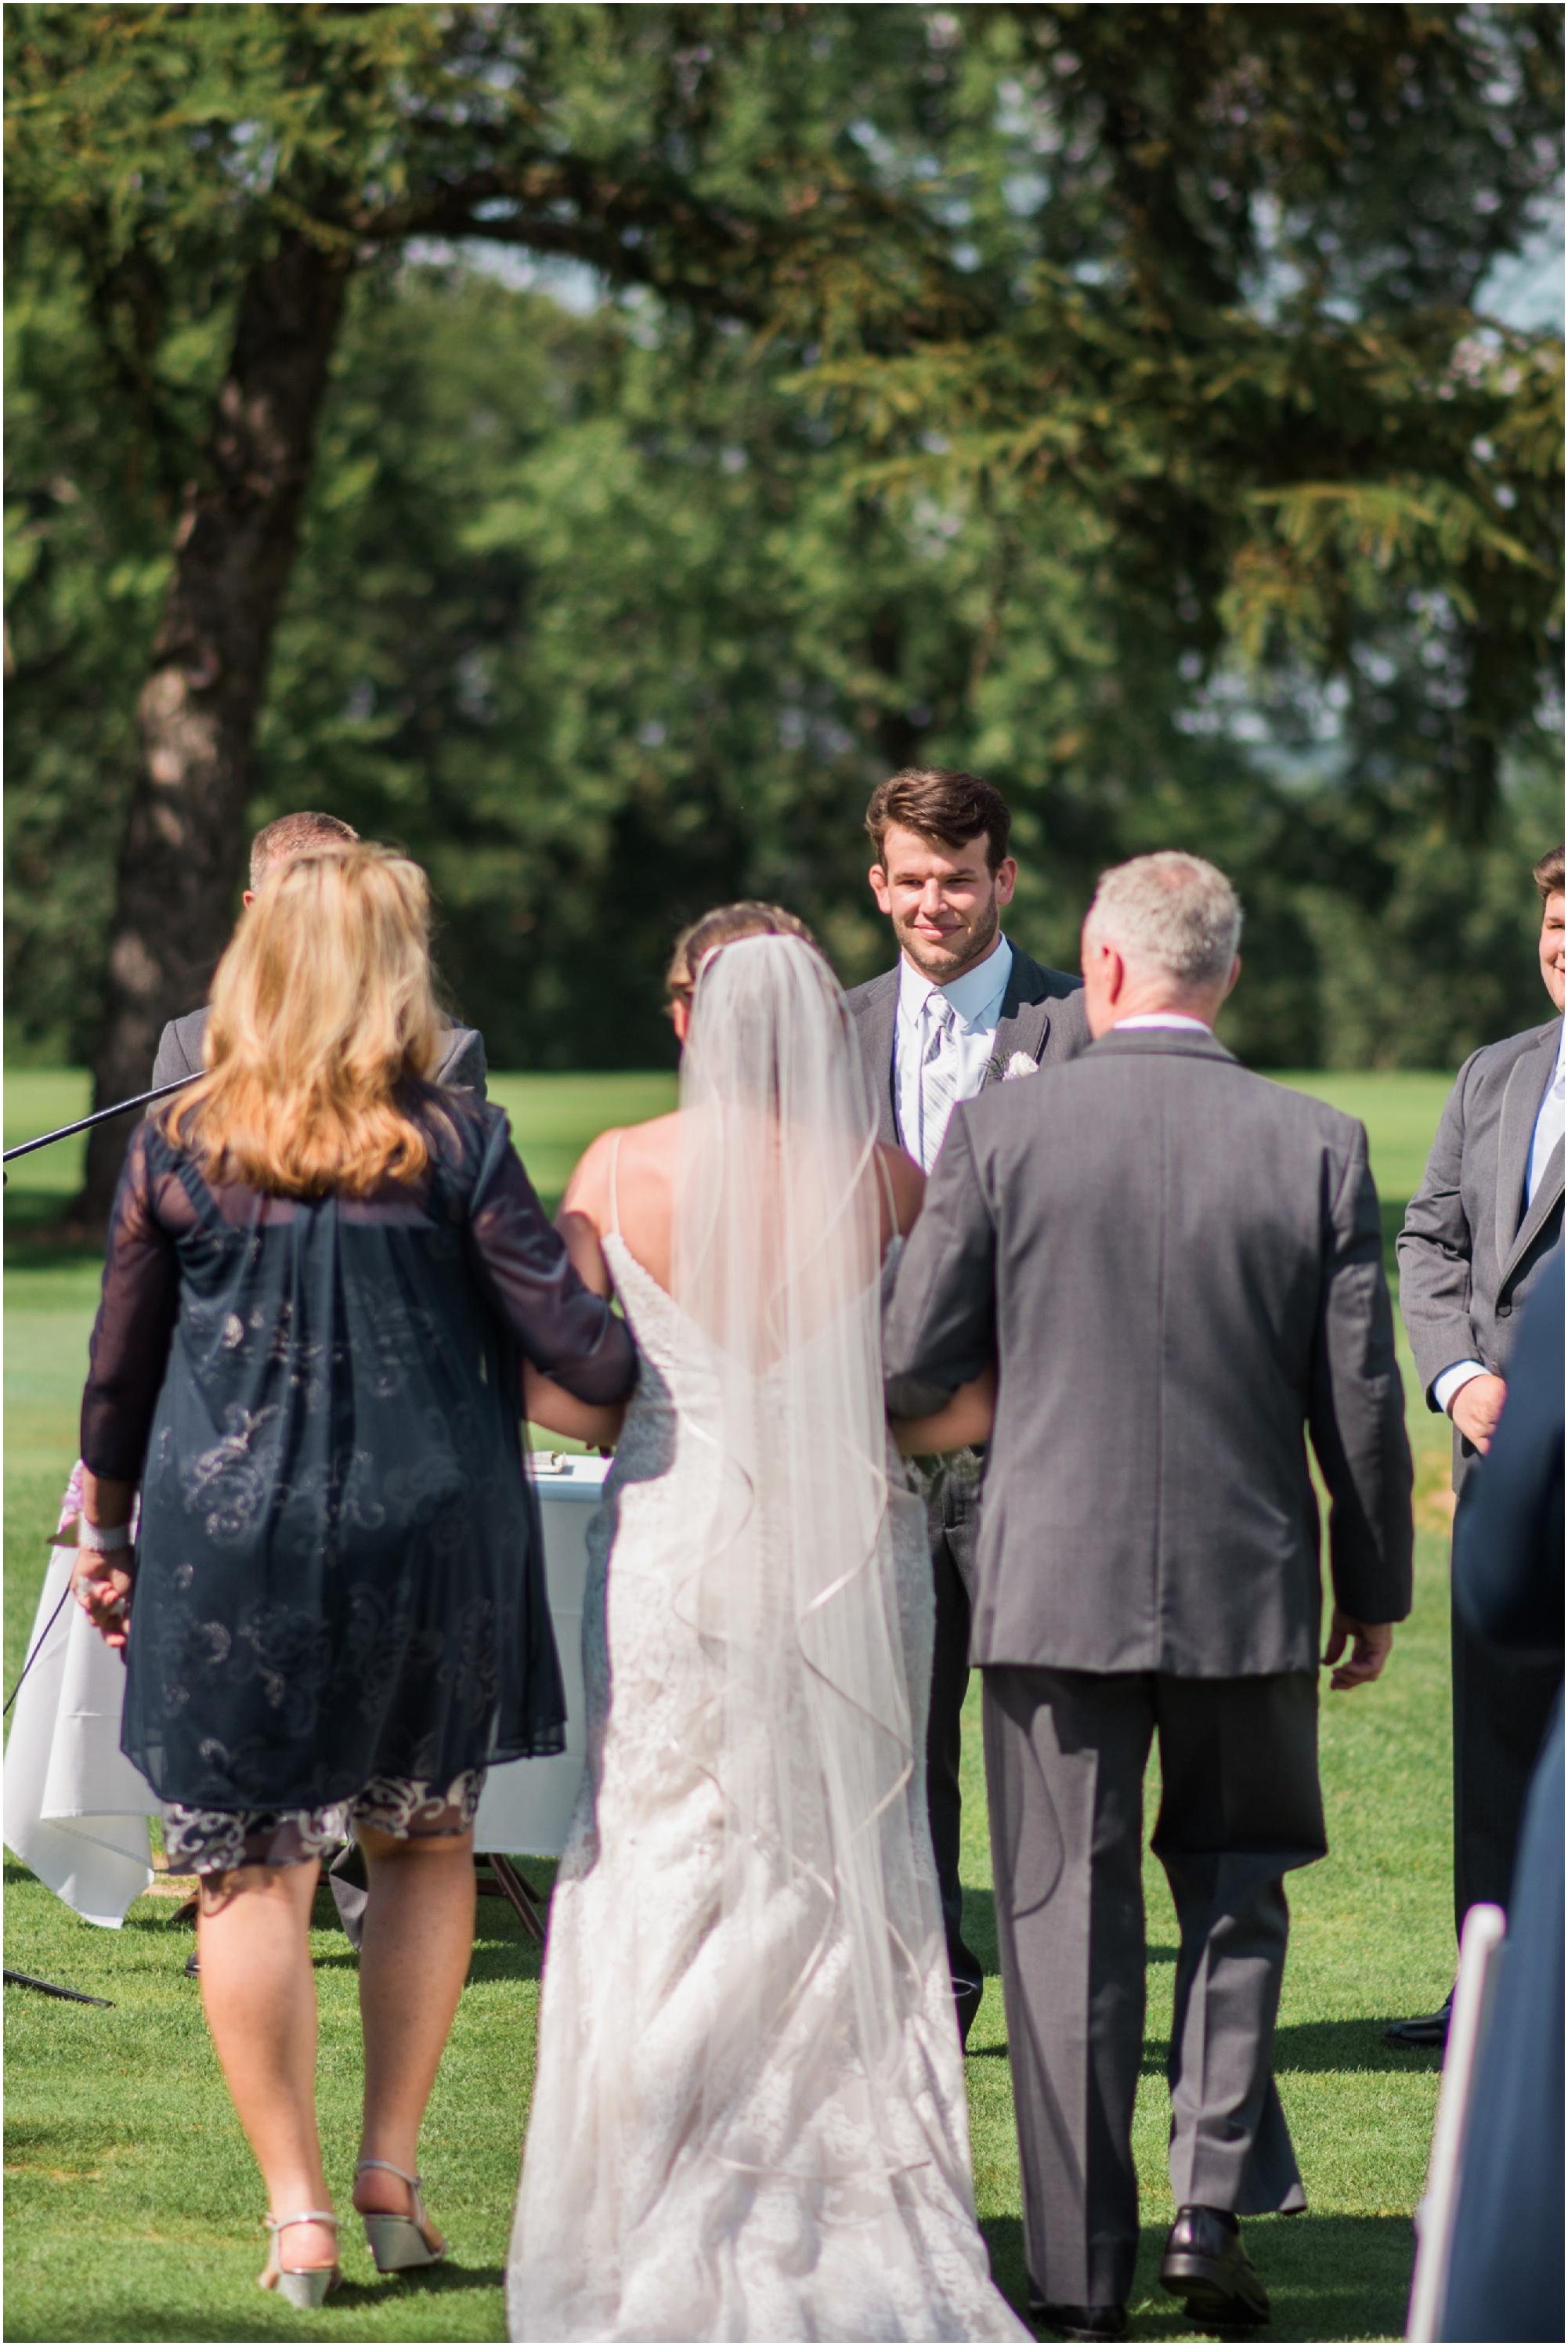 Wisconsin-Wedding-Photographer-Reedsburg-Country-Club-Kaela-and Matt-Wedding-434.jpg